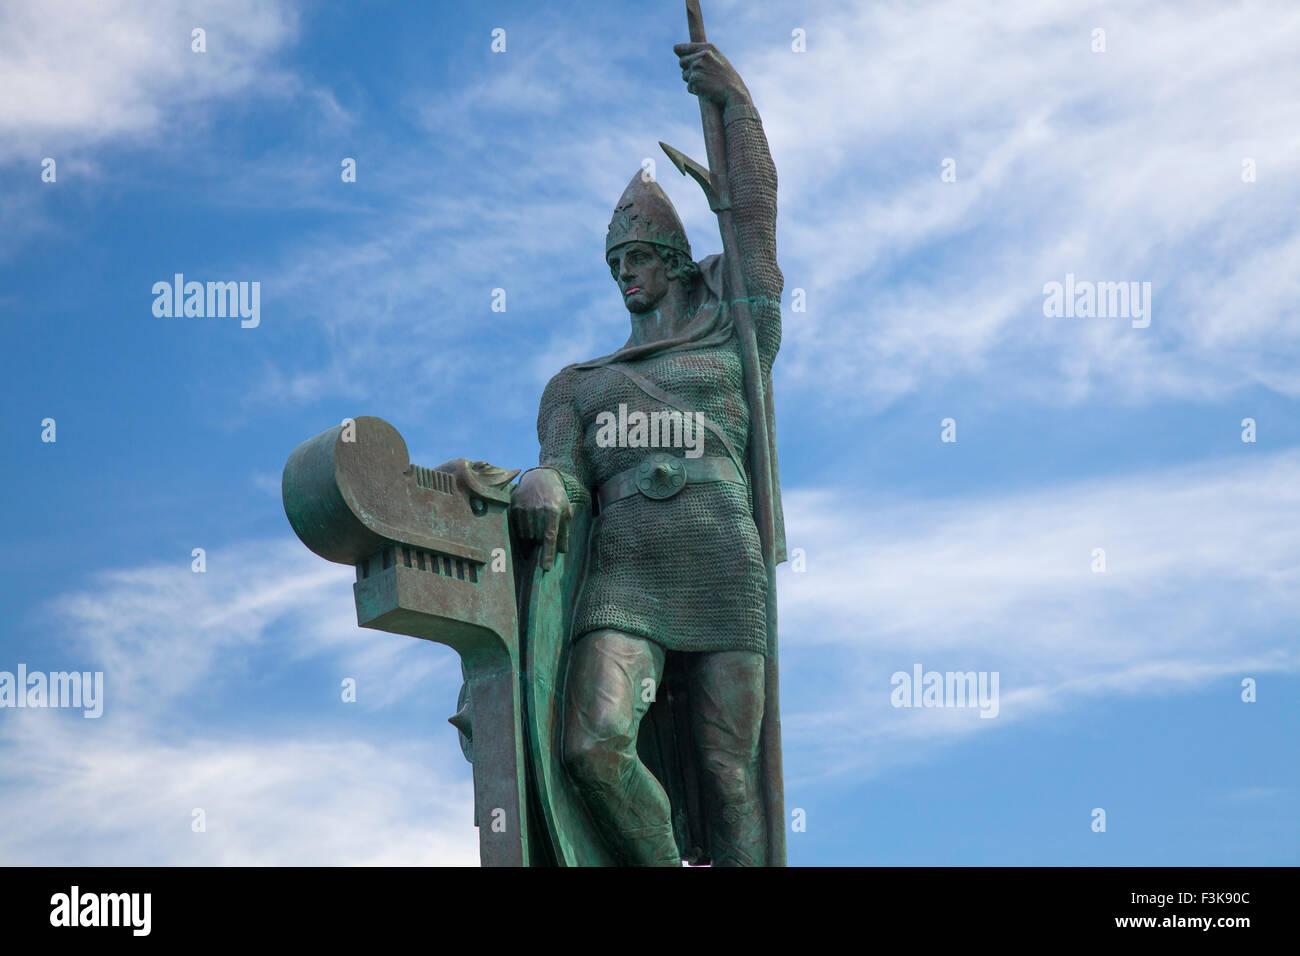 Statue of Ingolfur Arnarson, first Viking settler in Iceland, Arnarholl, Reykjavik, Iceland. - Stock Image